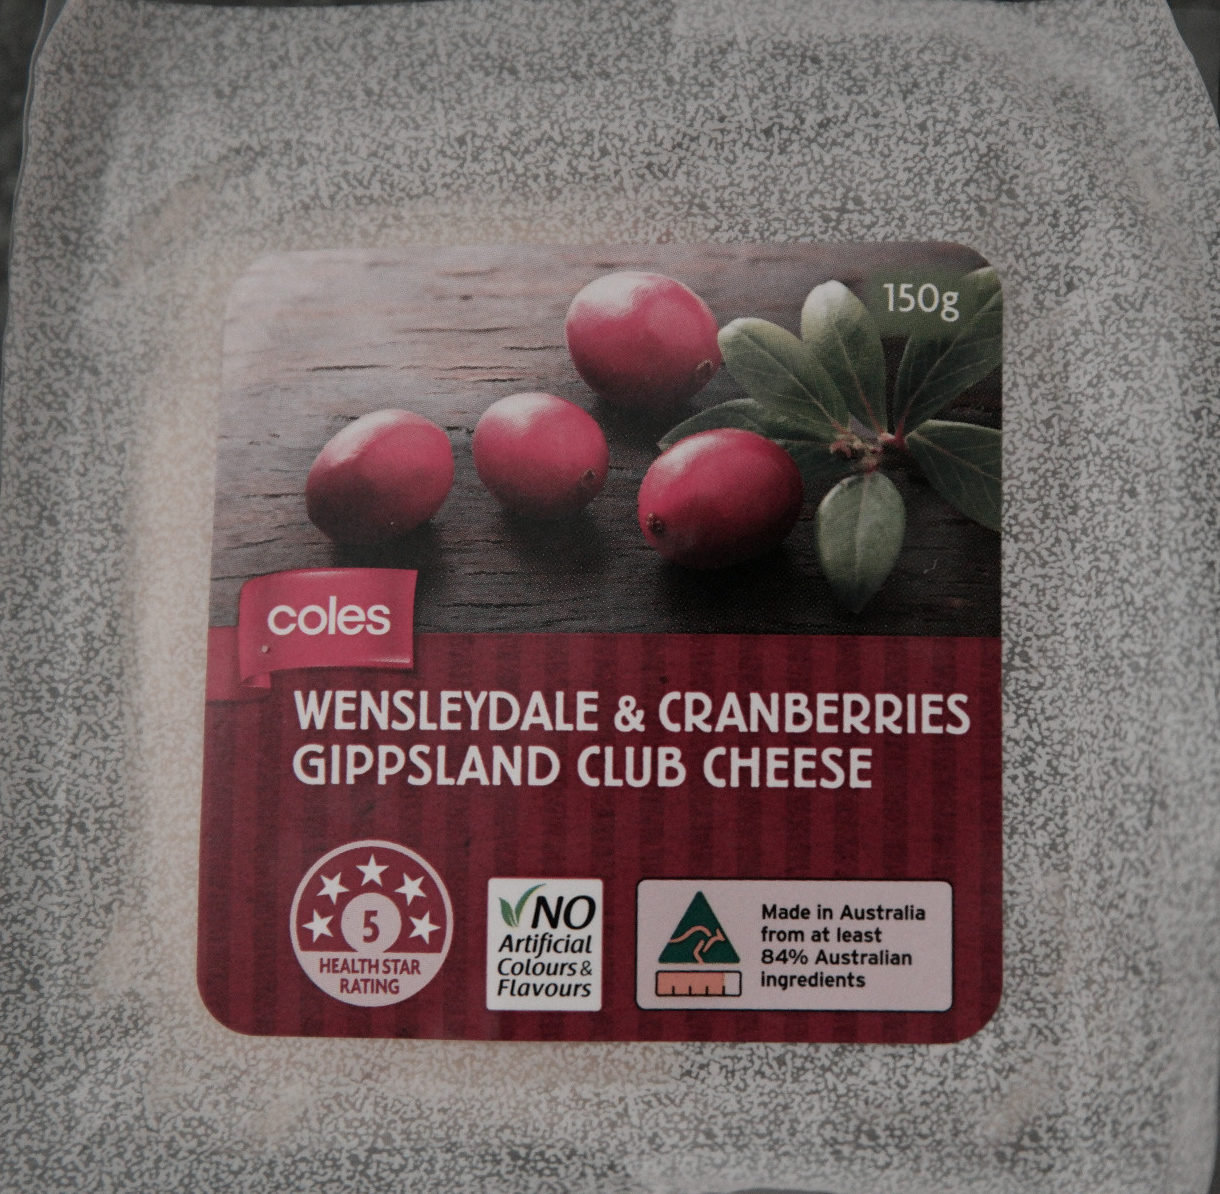 Wensleydale & Cranberries Gippsland Club Cheese - Product - en